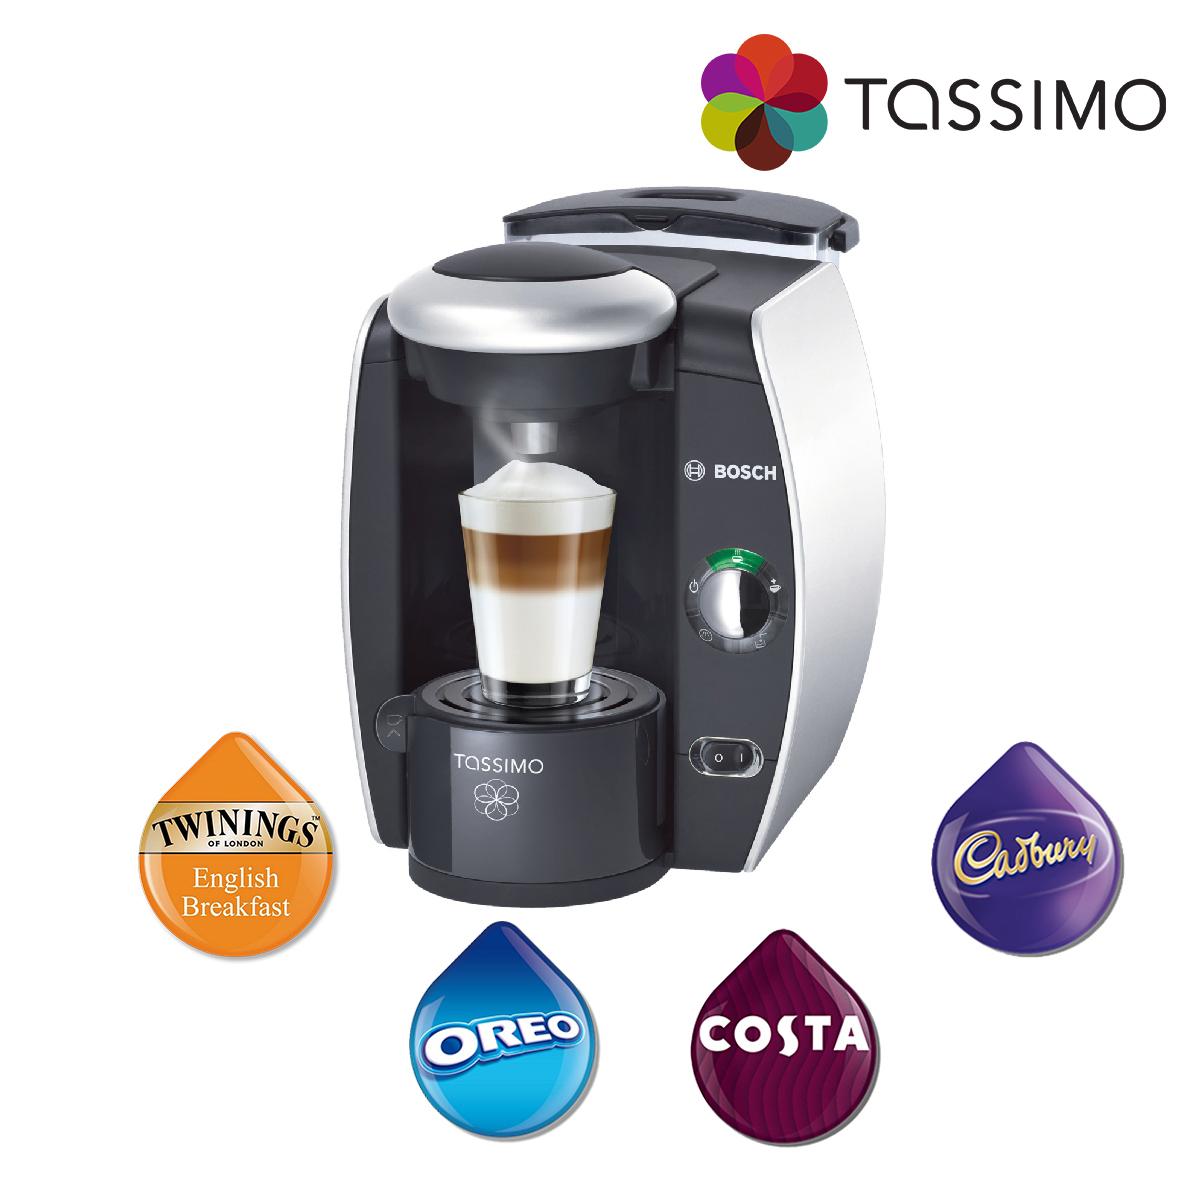 Bosch tassimo fidelia tas4011gb costa coffee hot drinks - Support capsule tassimo bosch ...